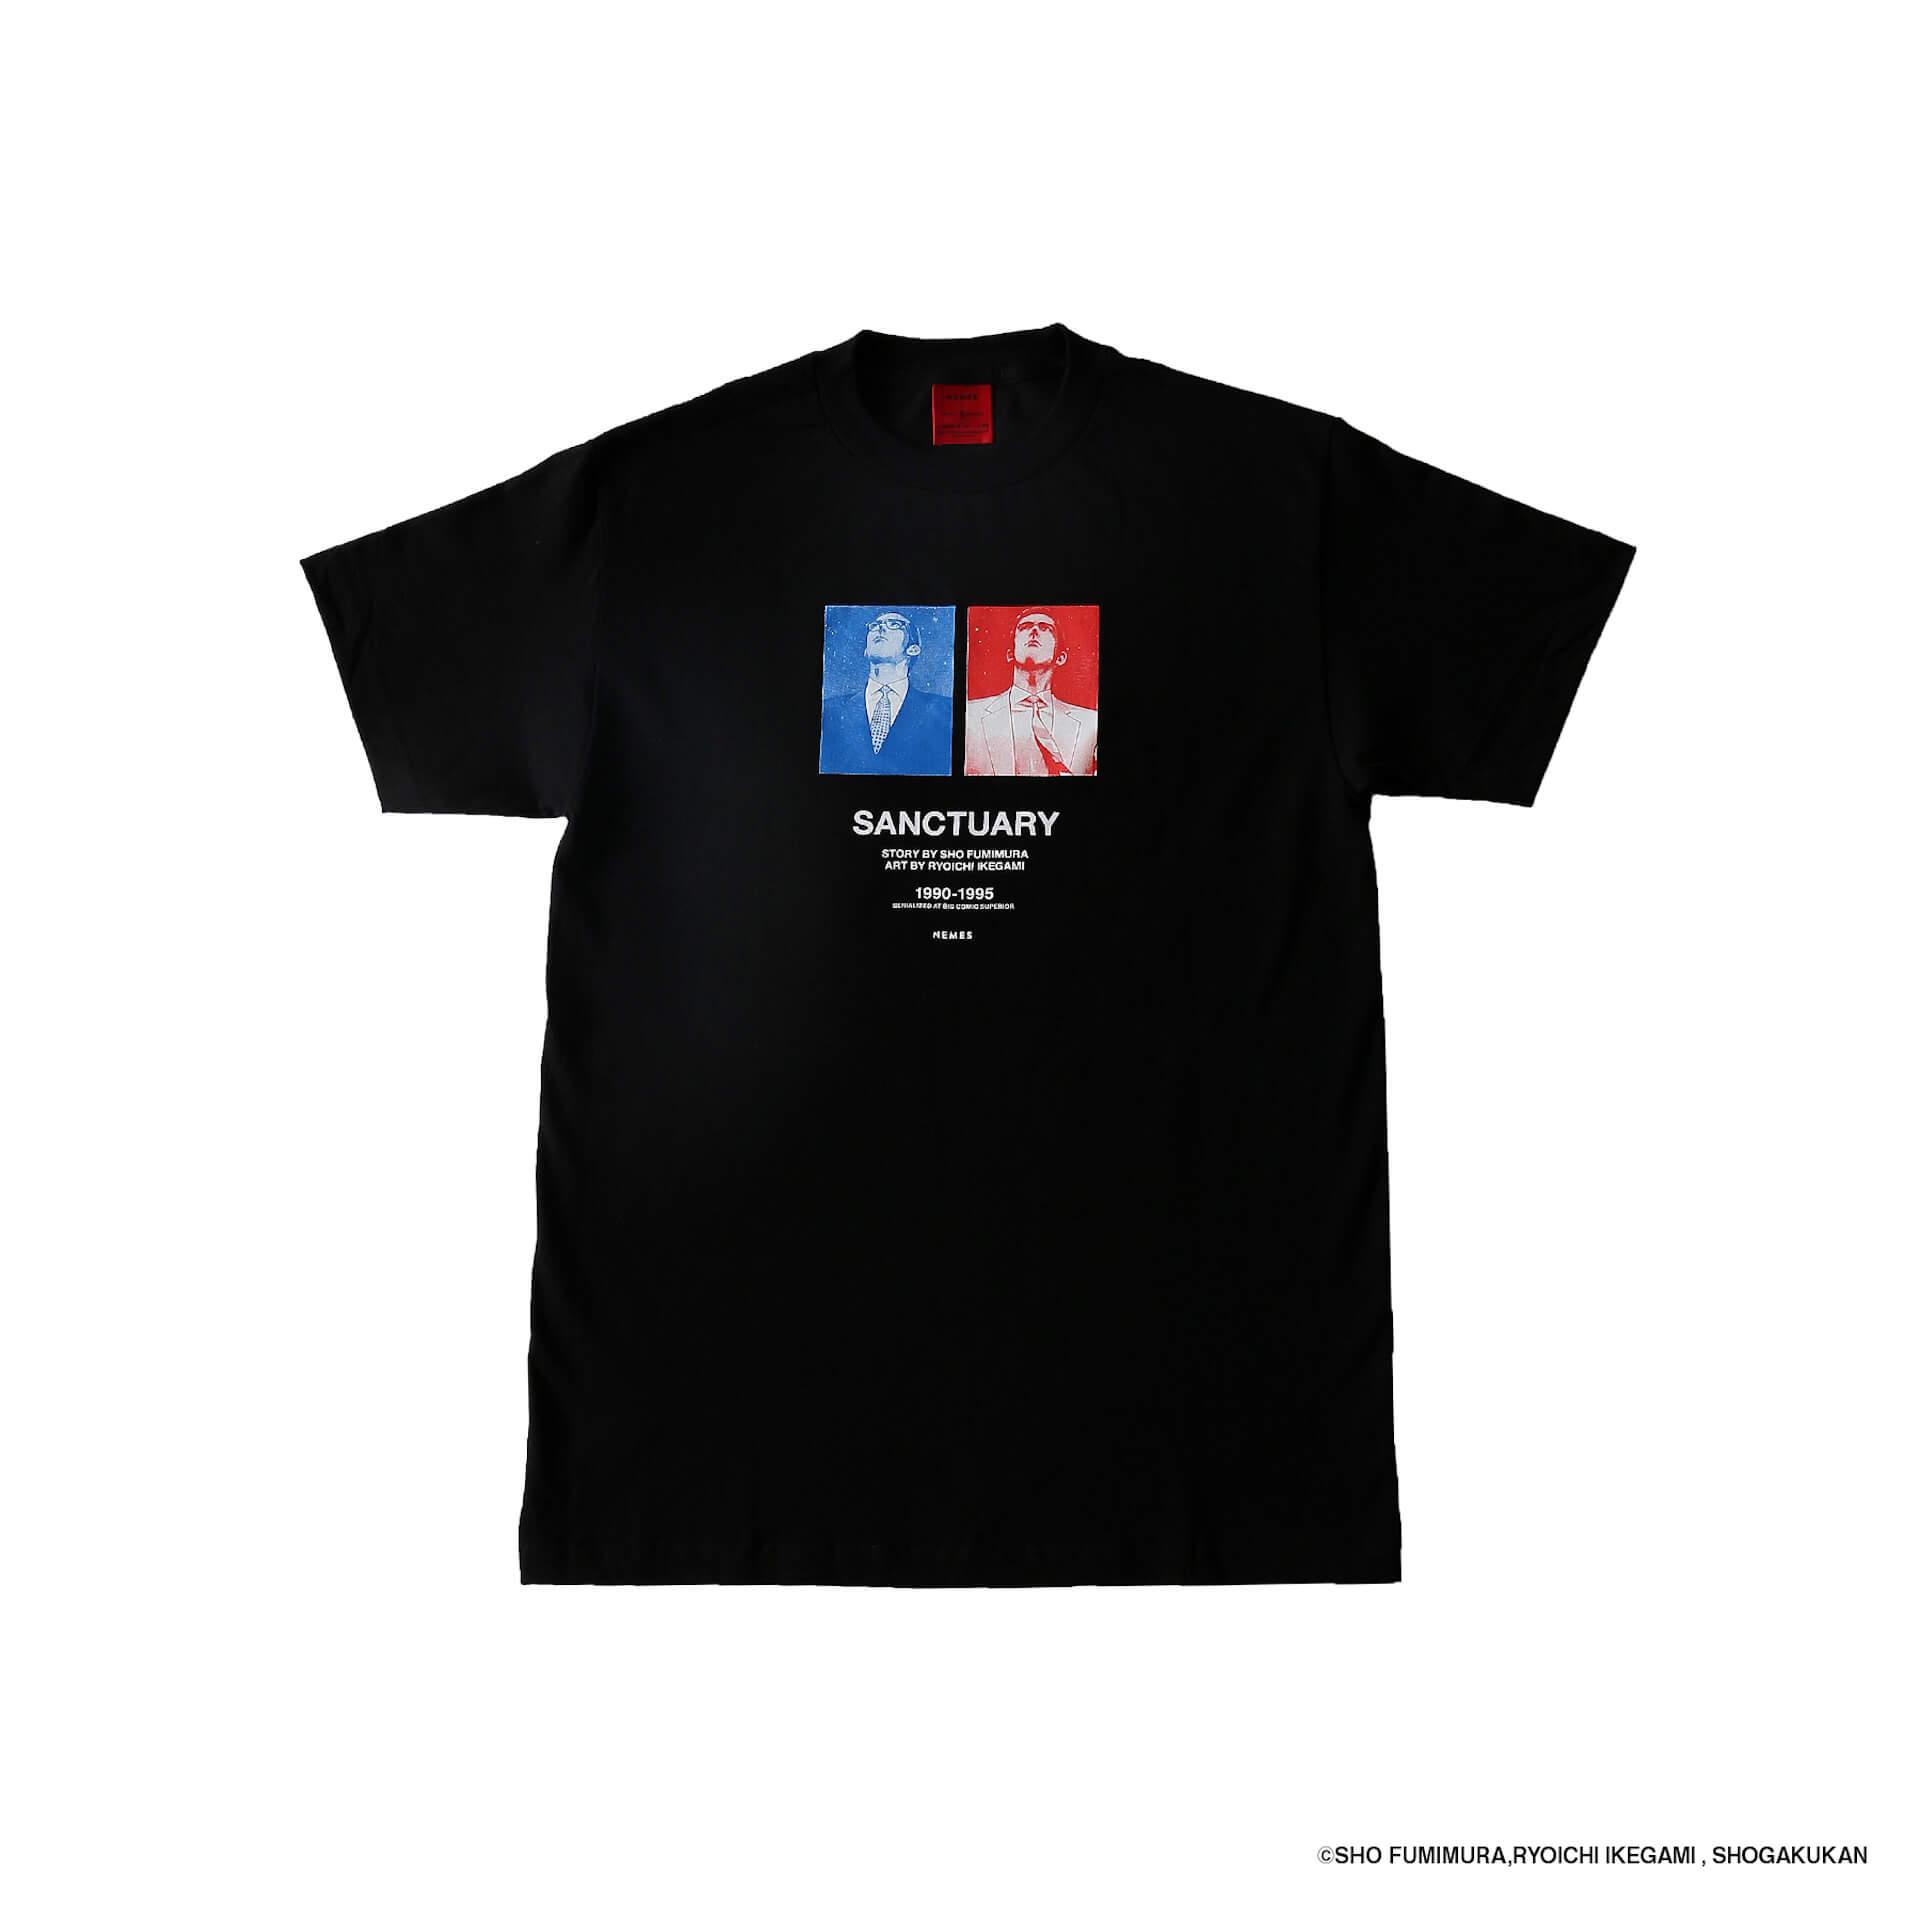 ZEN-LA-ROCKが手がけるブランド『NEMES』設立10周年記念で『サンクチュアリ』&JOURNAL STANDARDとコラボ! lf200424_zenla_sanctuary_31